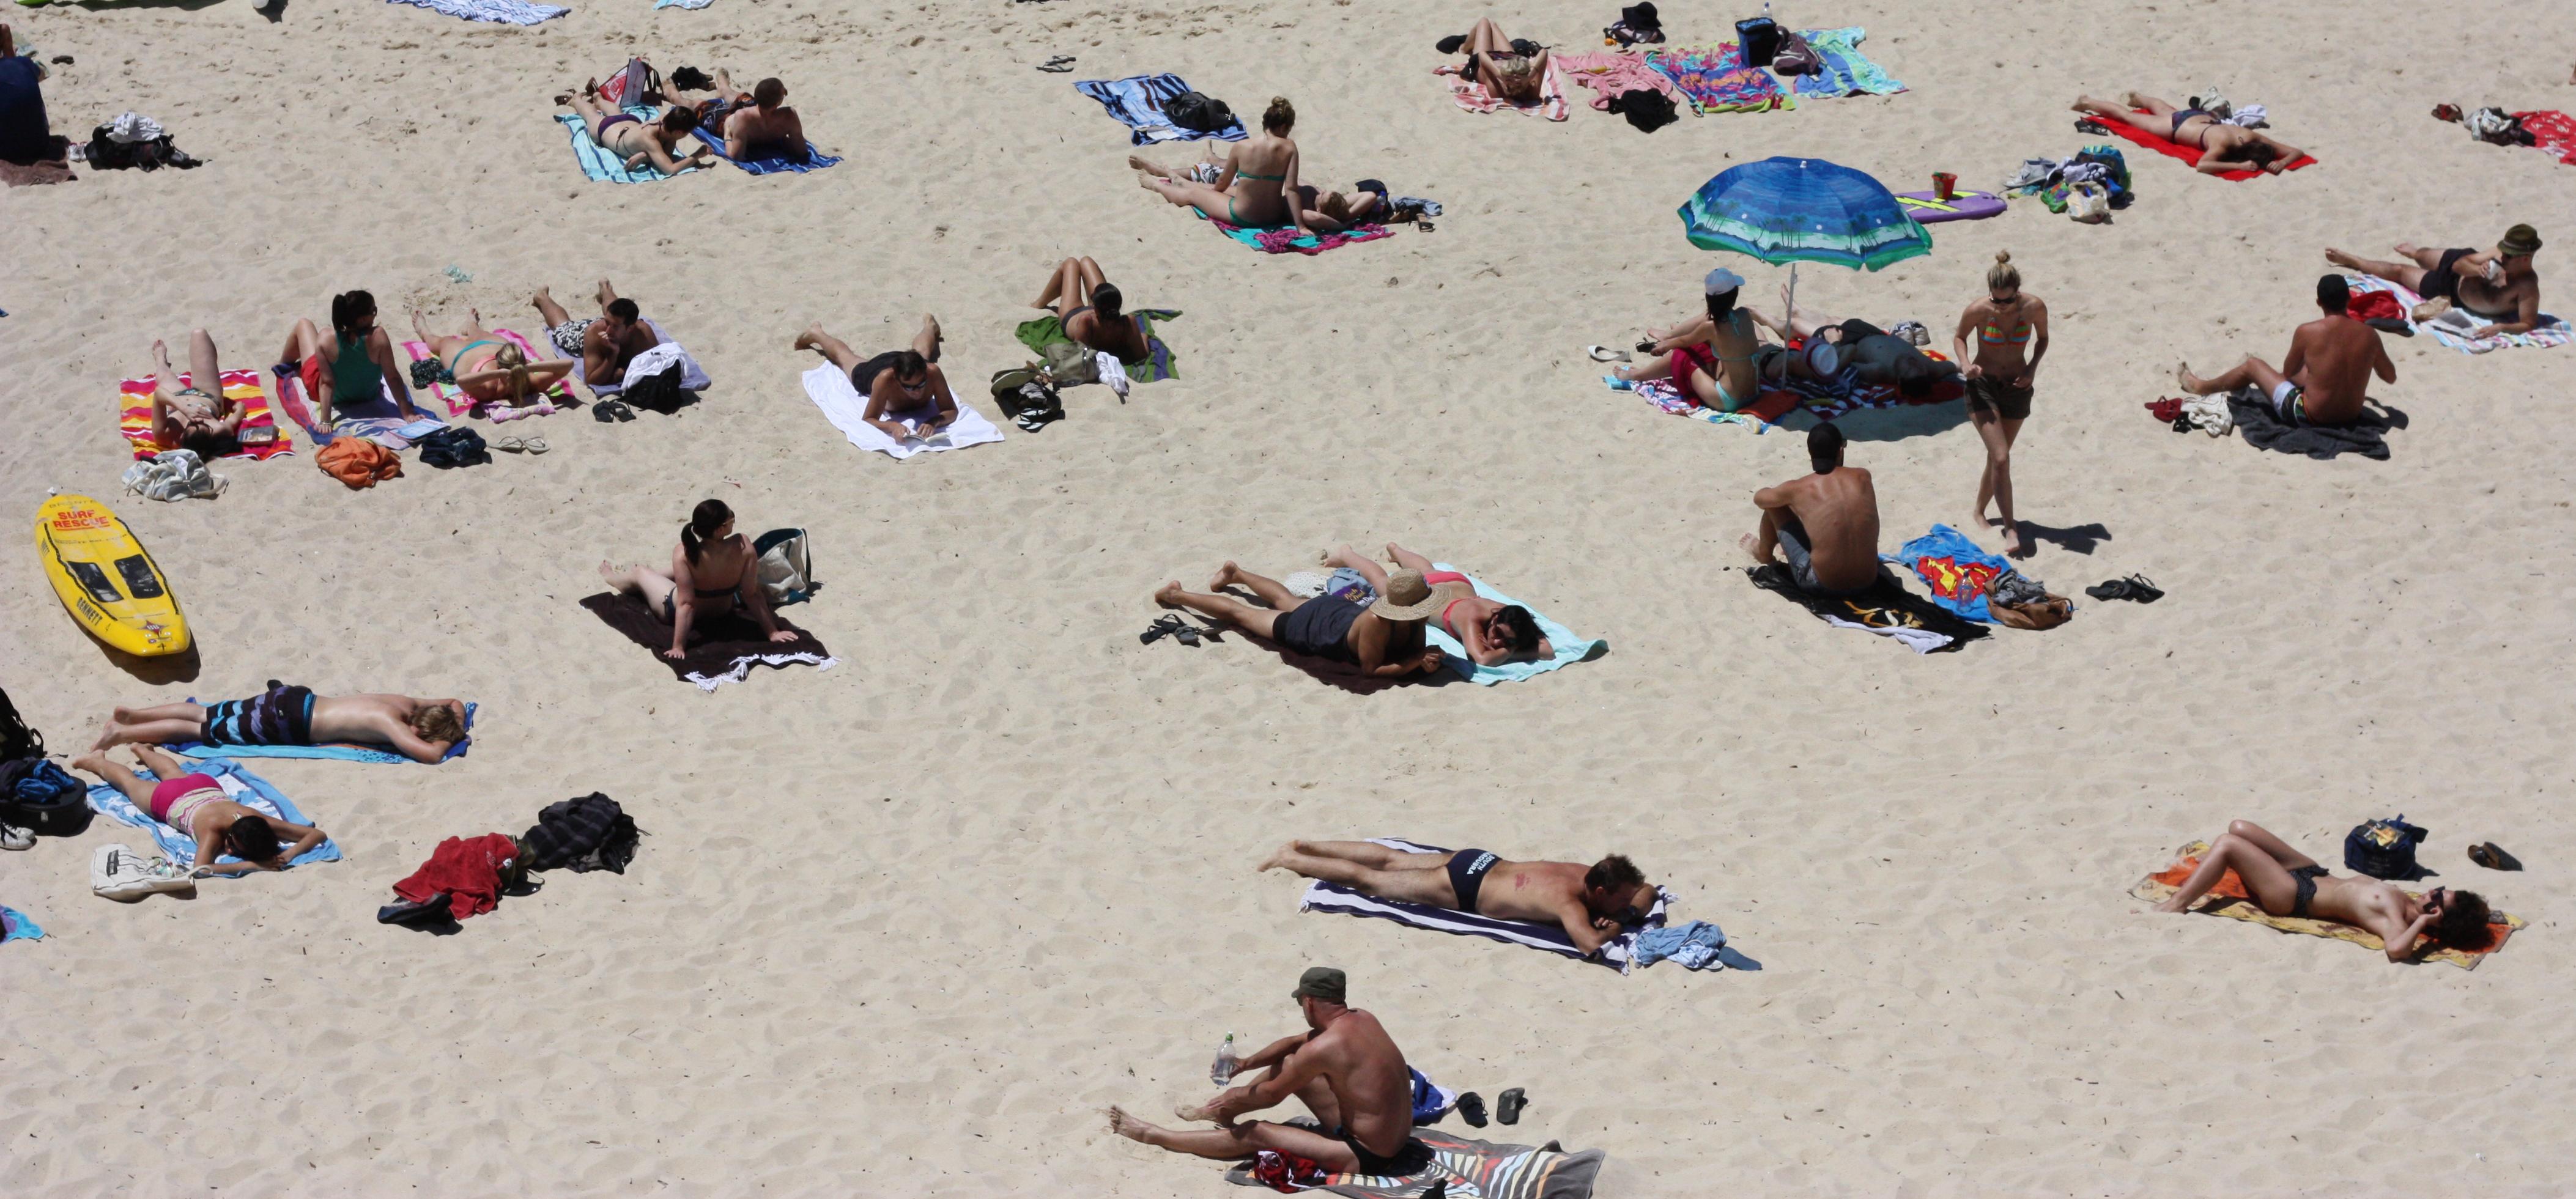 Sunbathers On The Beach Best Beaches In World